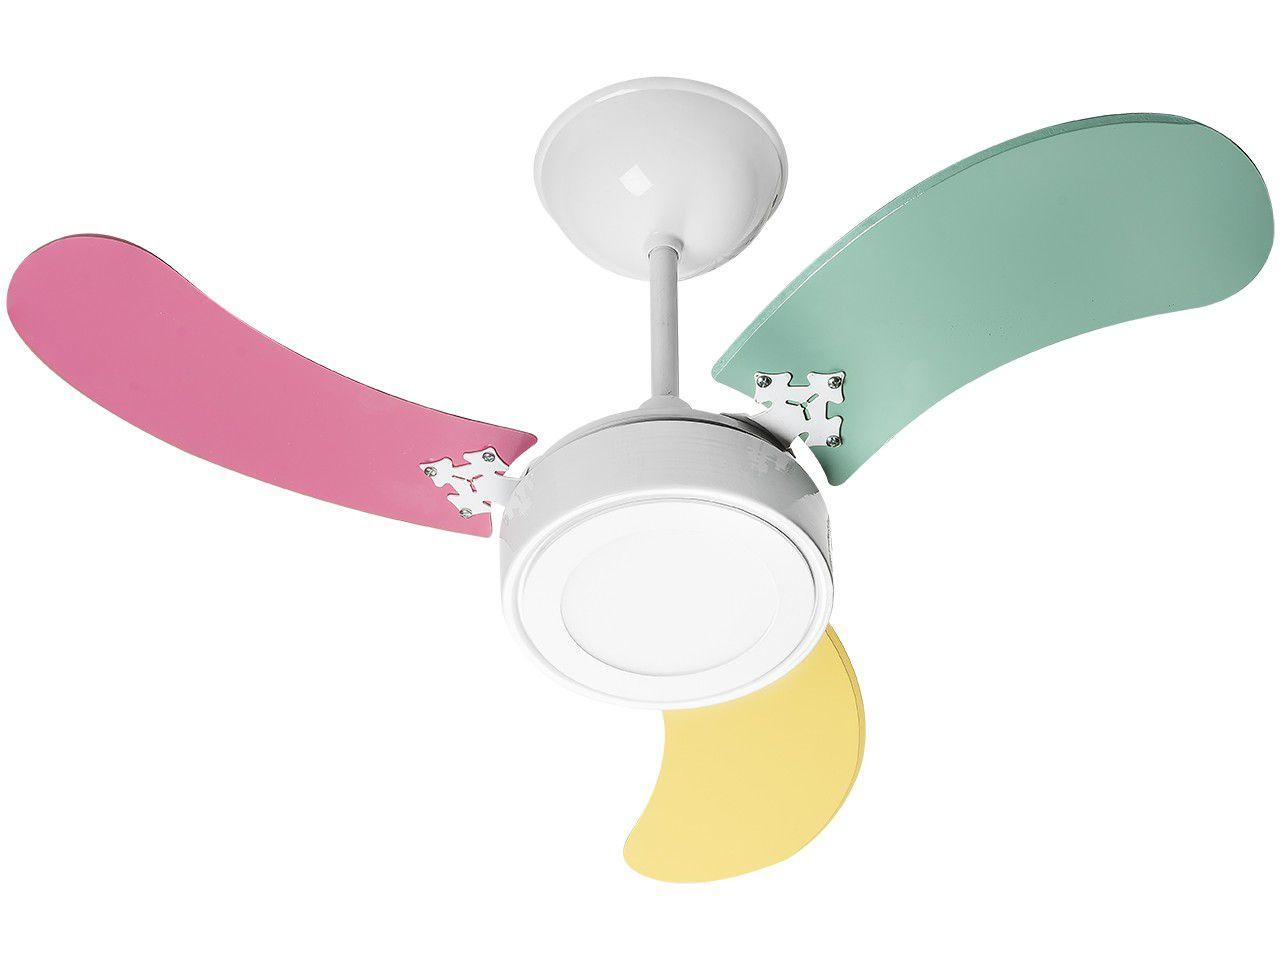 Ventilador de Teto Venti-Delta New LED Colors - 3 Pás 3 Velocidades